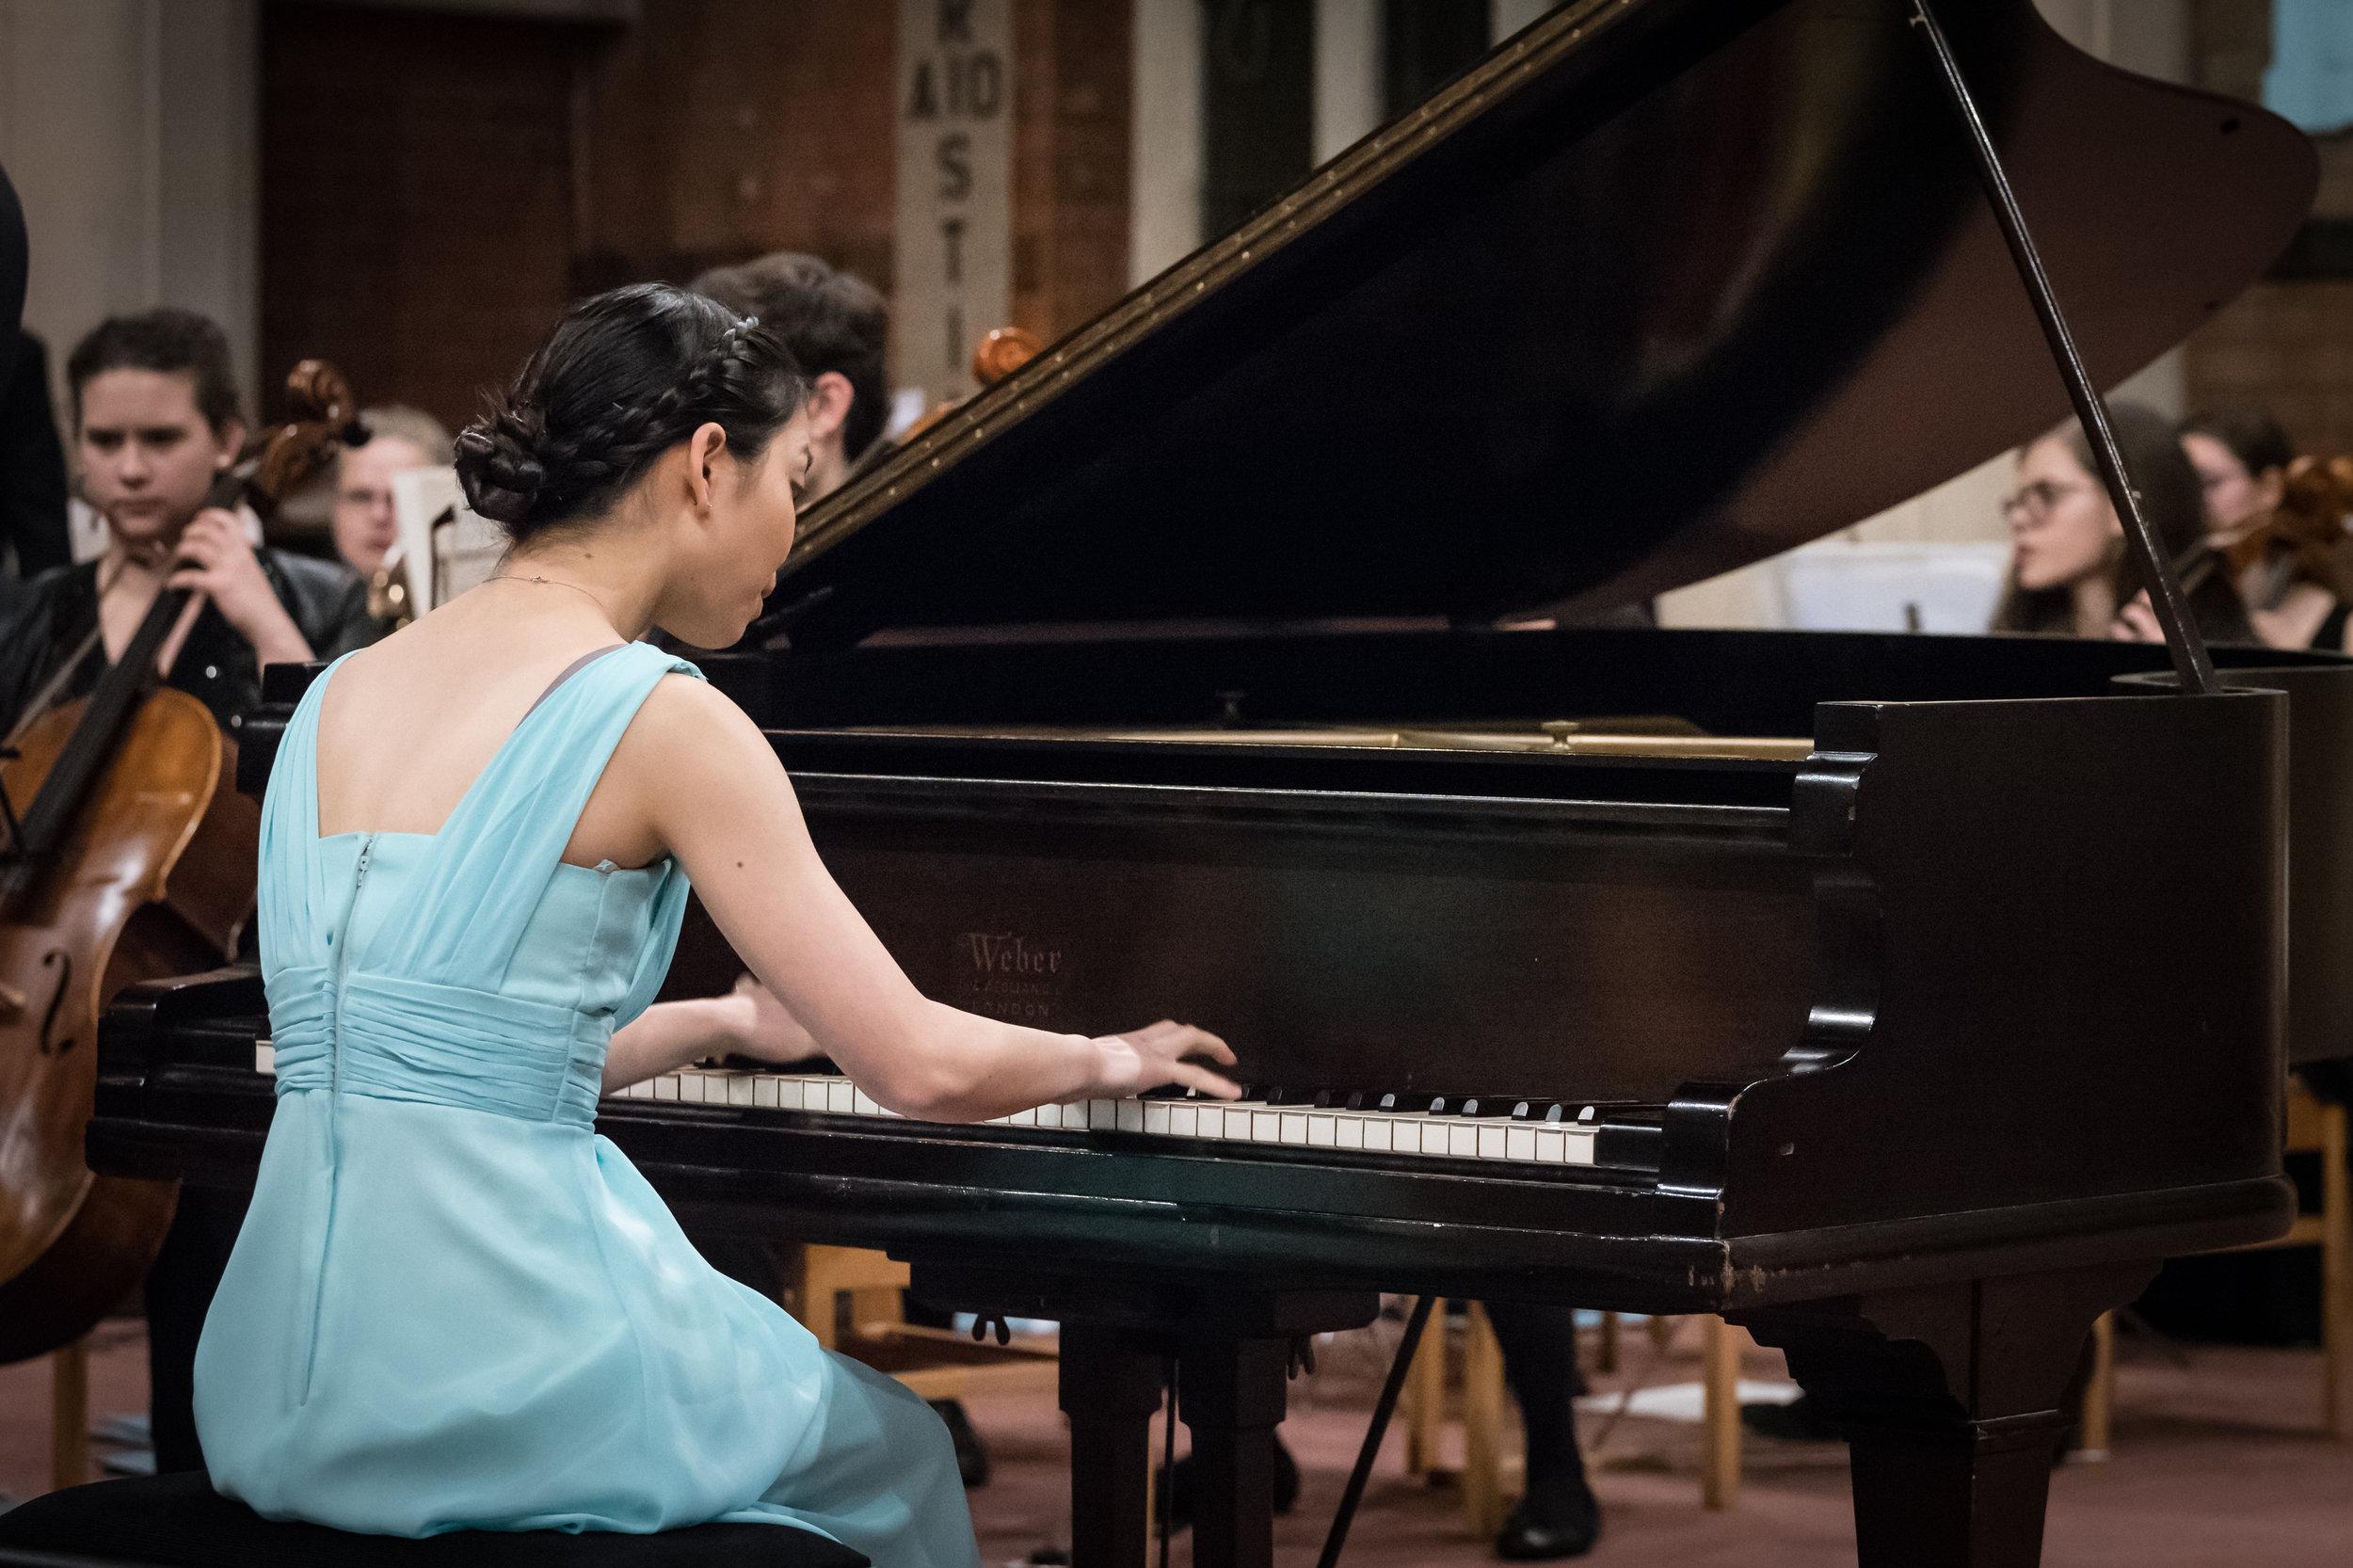 CUPO - performance - pianist 02-12-17 -02.jpg